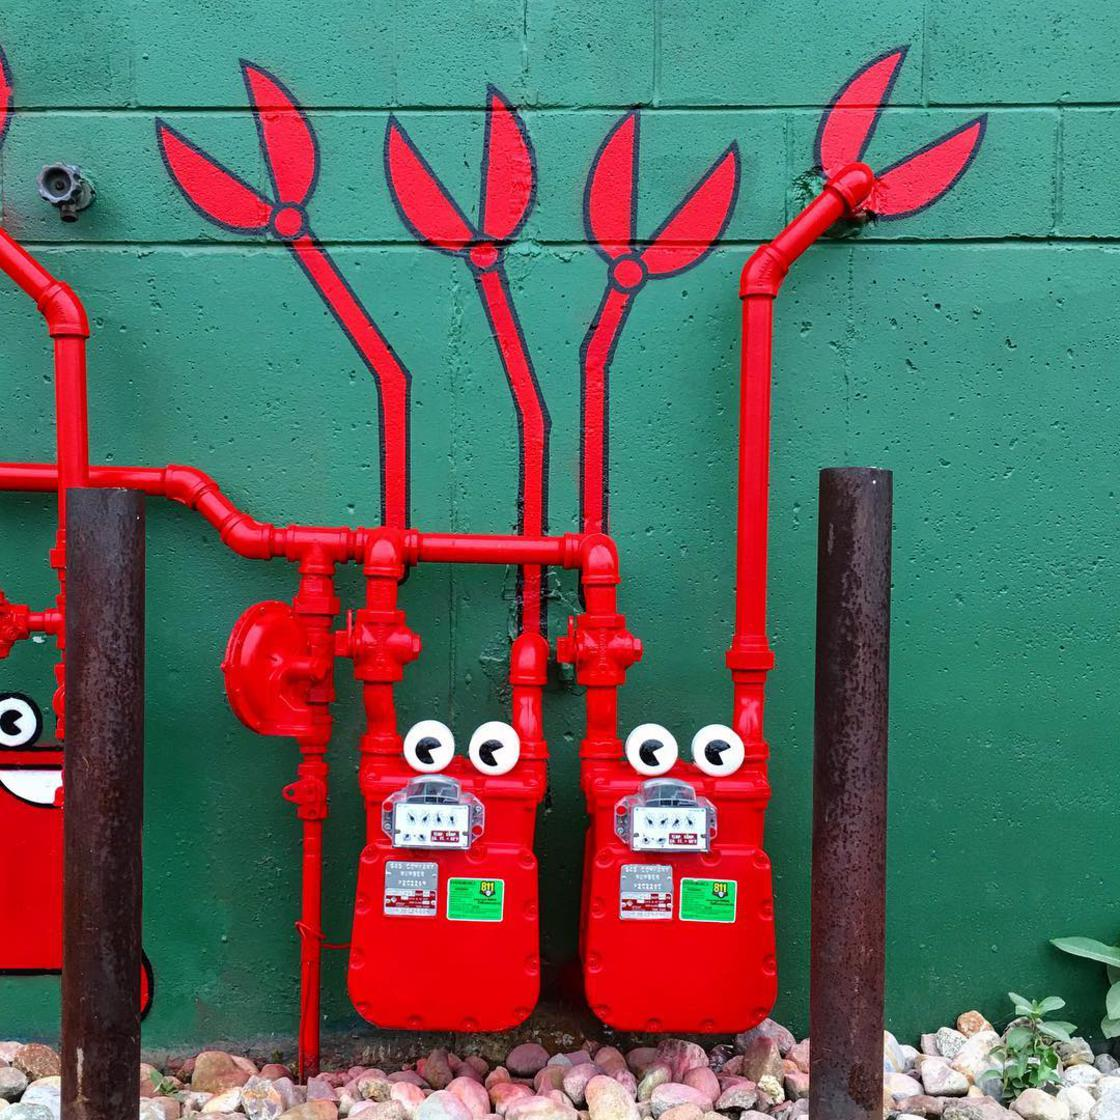 tom-bob-street-art-new-york-18.jpg